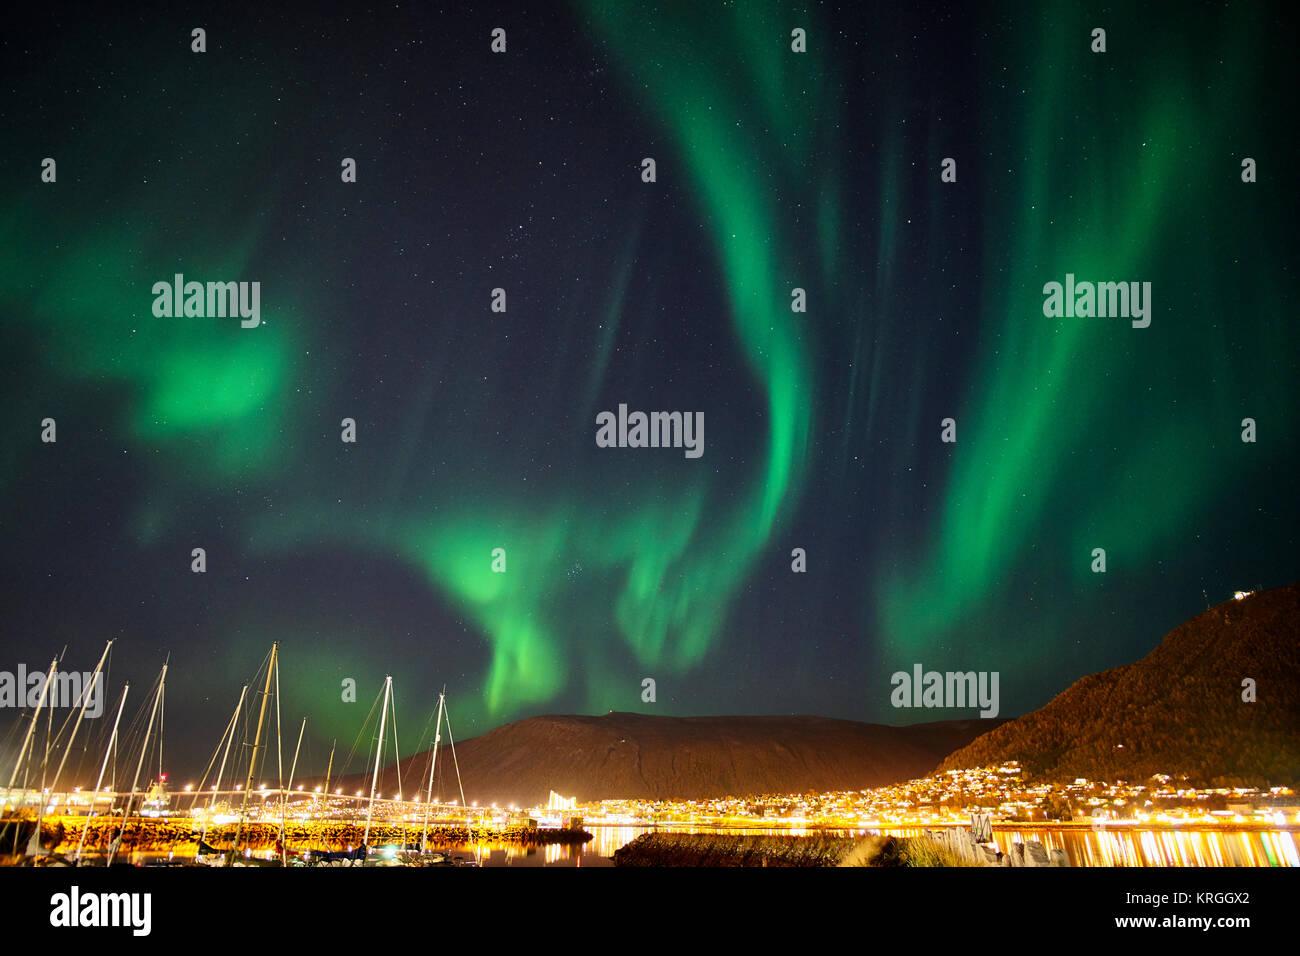 Aurora Borealis, Northern Lights over Tromso, Troms, Norway - Stock Image